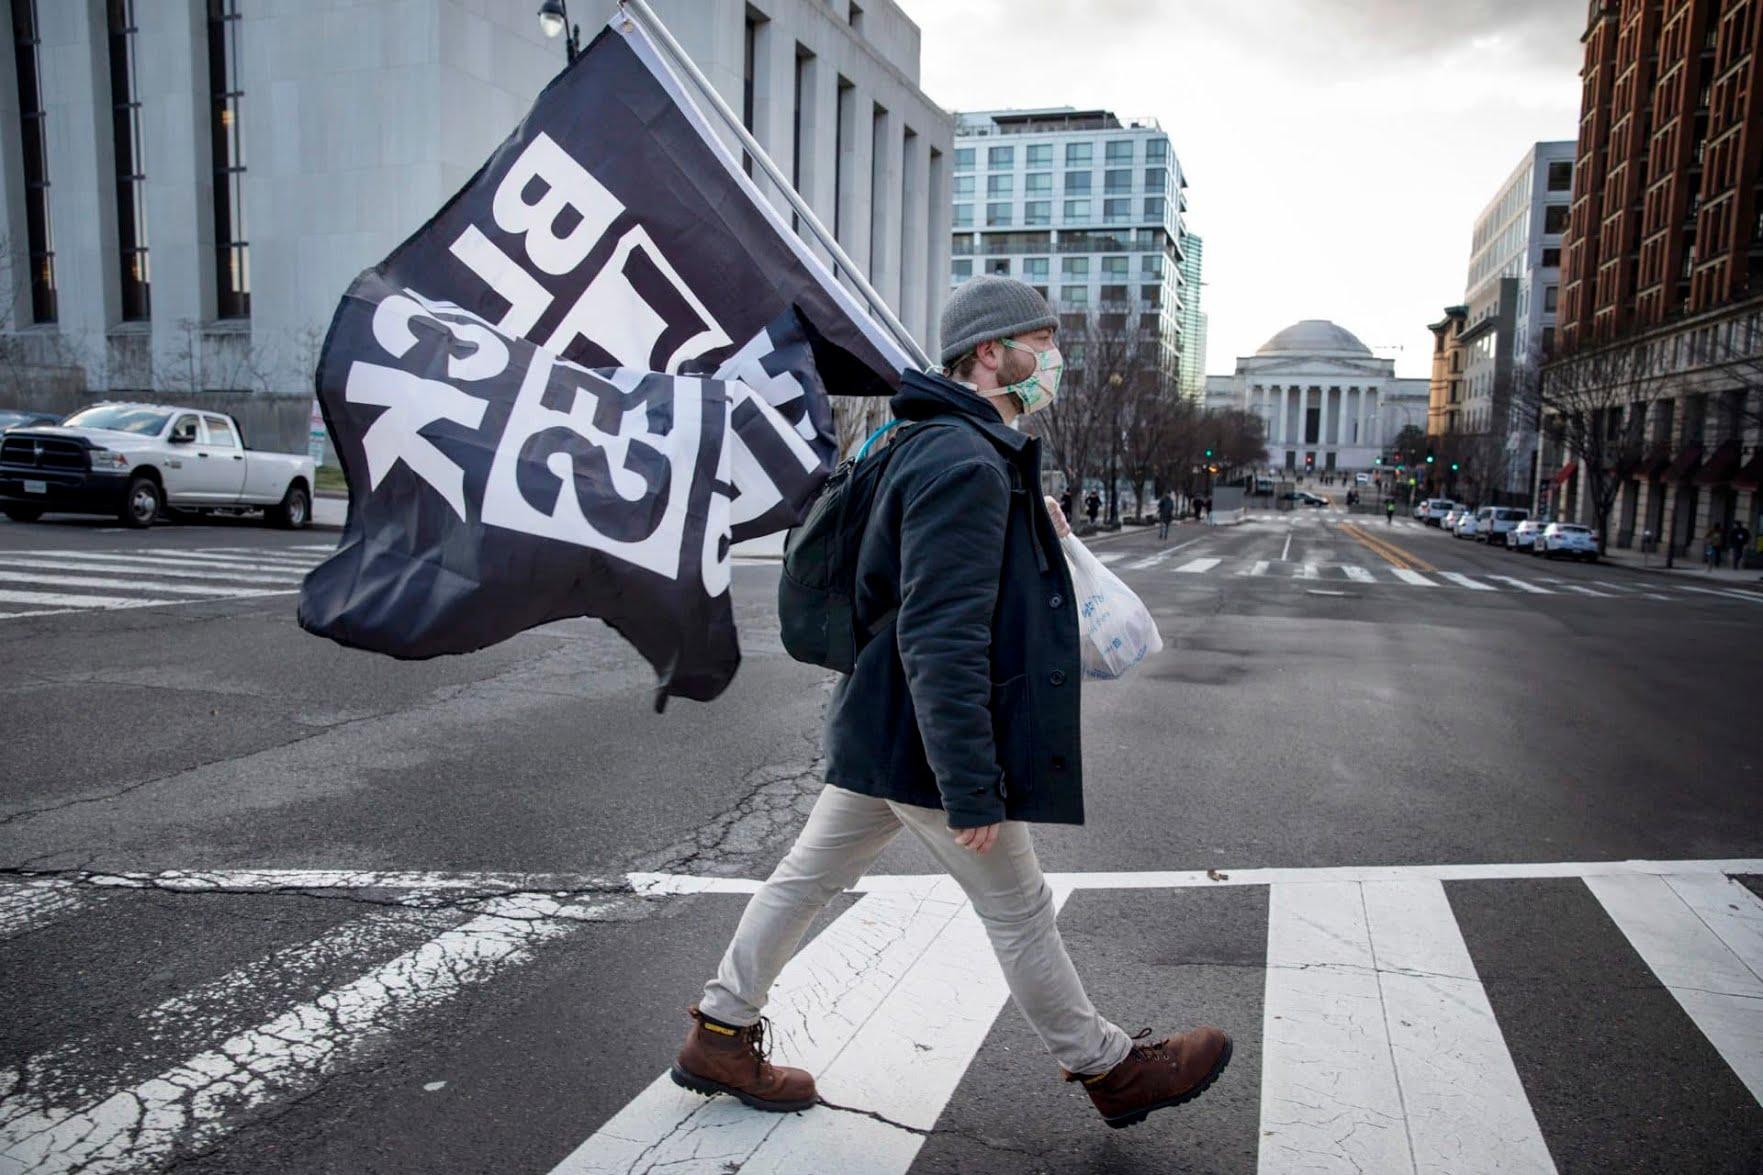 Jack Curtz, who lives in Boston, walks through downtown D.C. holding a Black Lives Matter flag. (Tyrone Turner/WAMU)